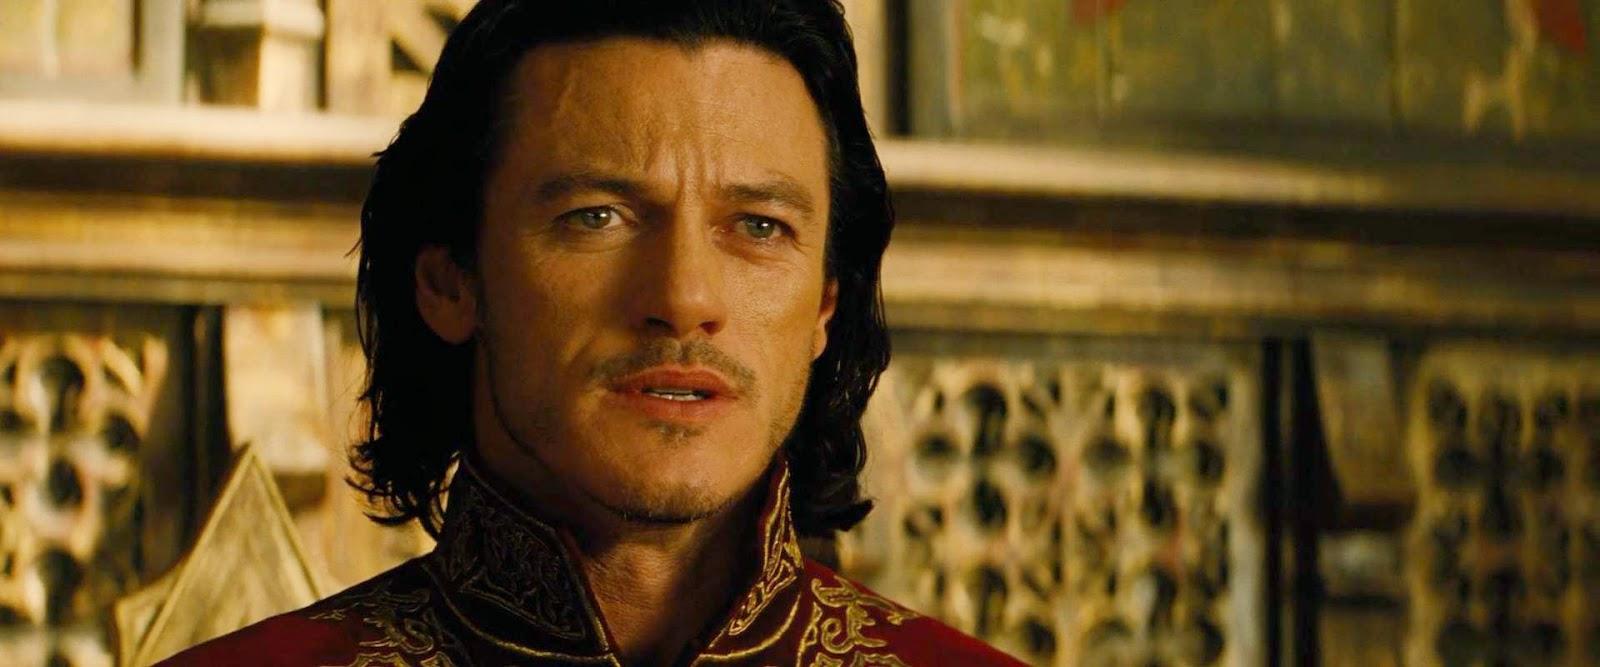 Dracula Untold (2014) 1080p S2 s Dracula Untold (2014) 1080p